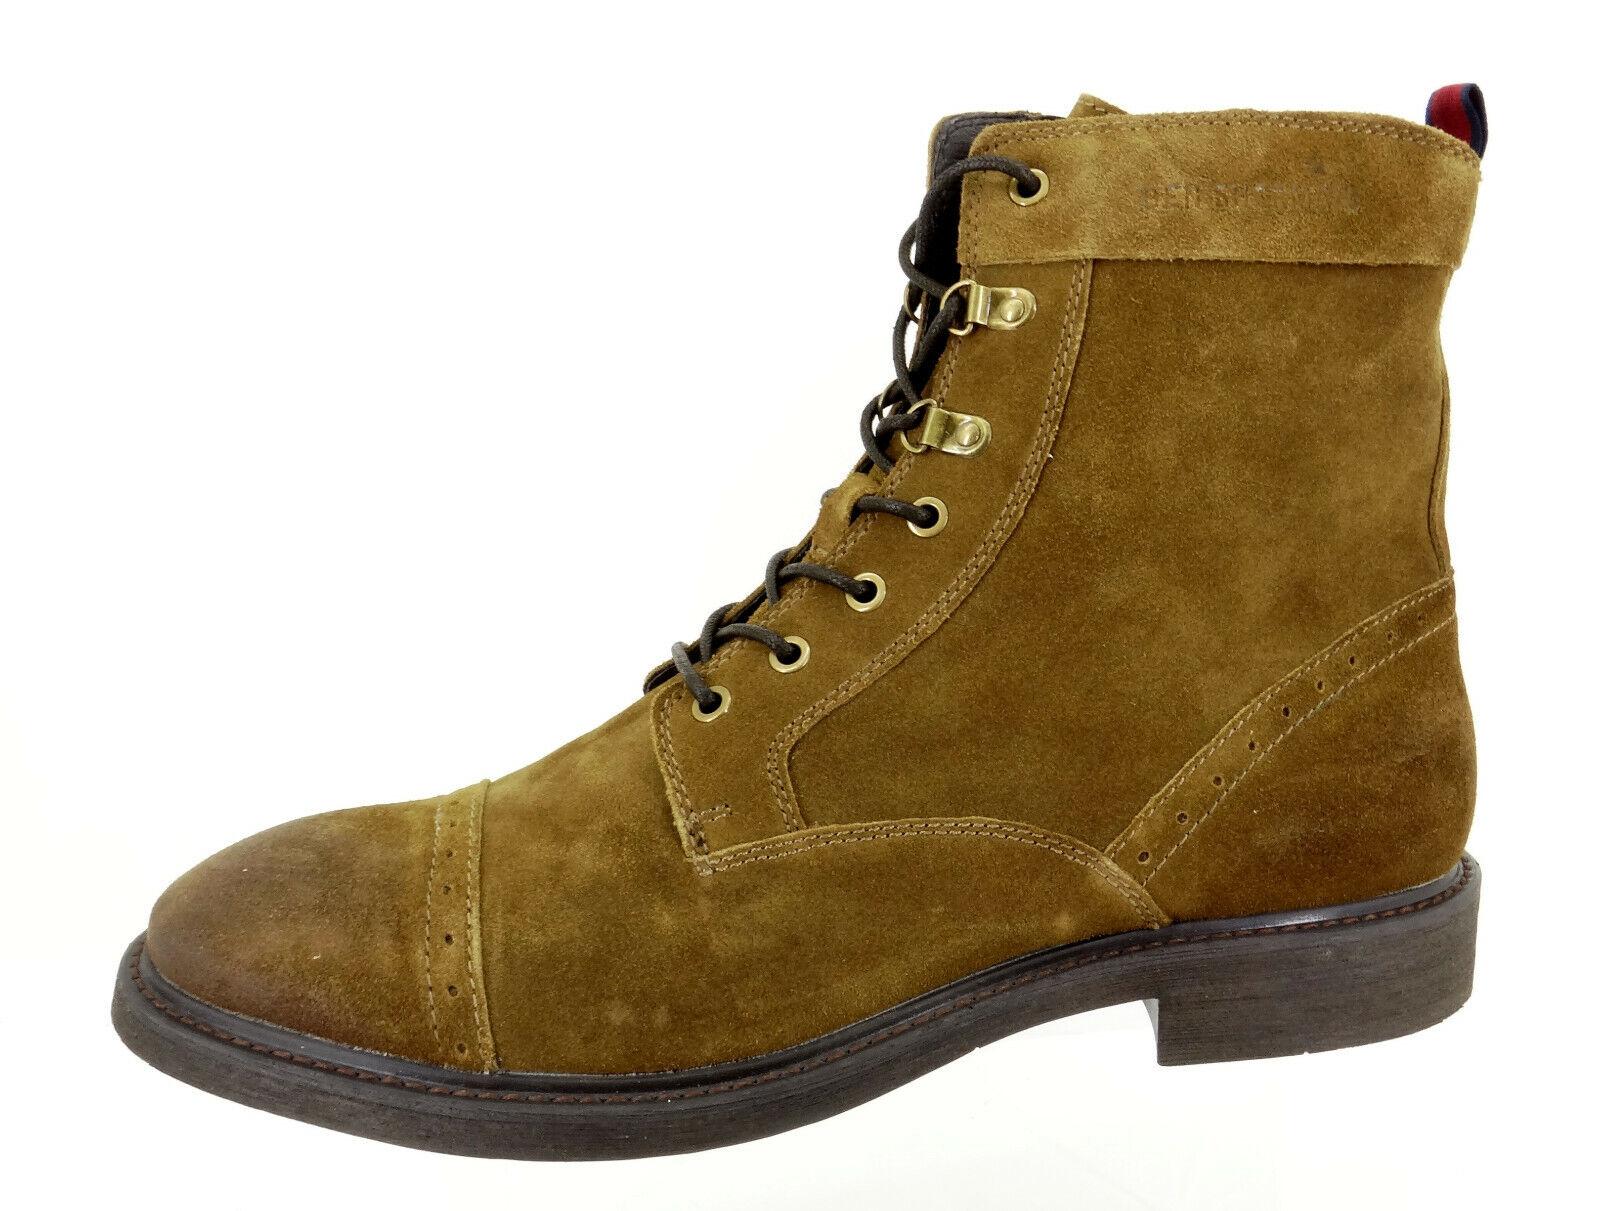 BEN SHERMAN Schuhe Stiefel Winterstiefel Herrenstiefel Stiefel Gr  43 - 9